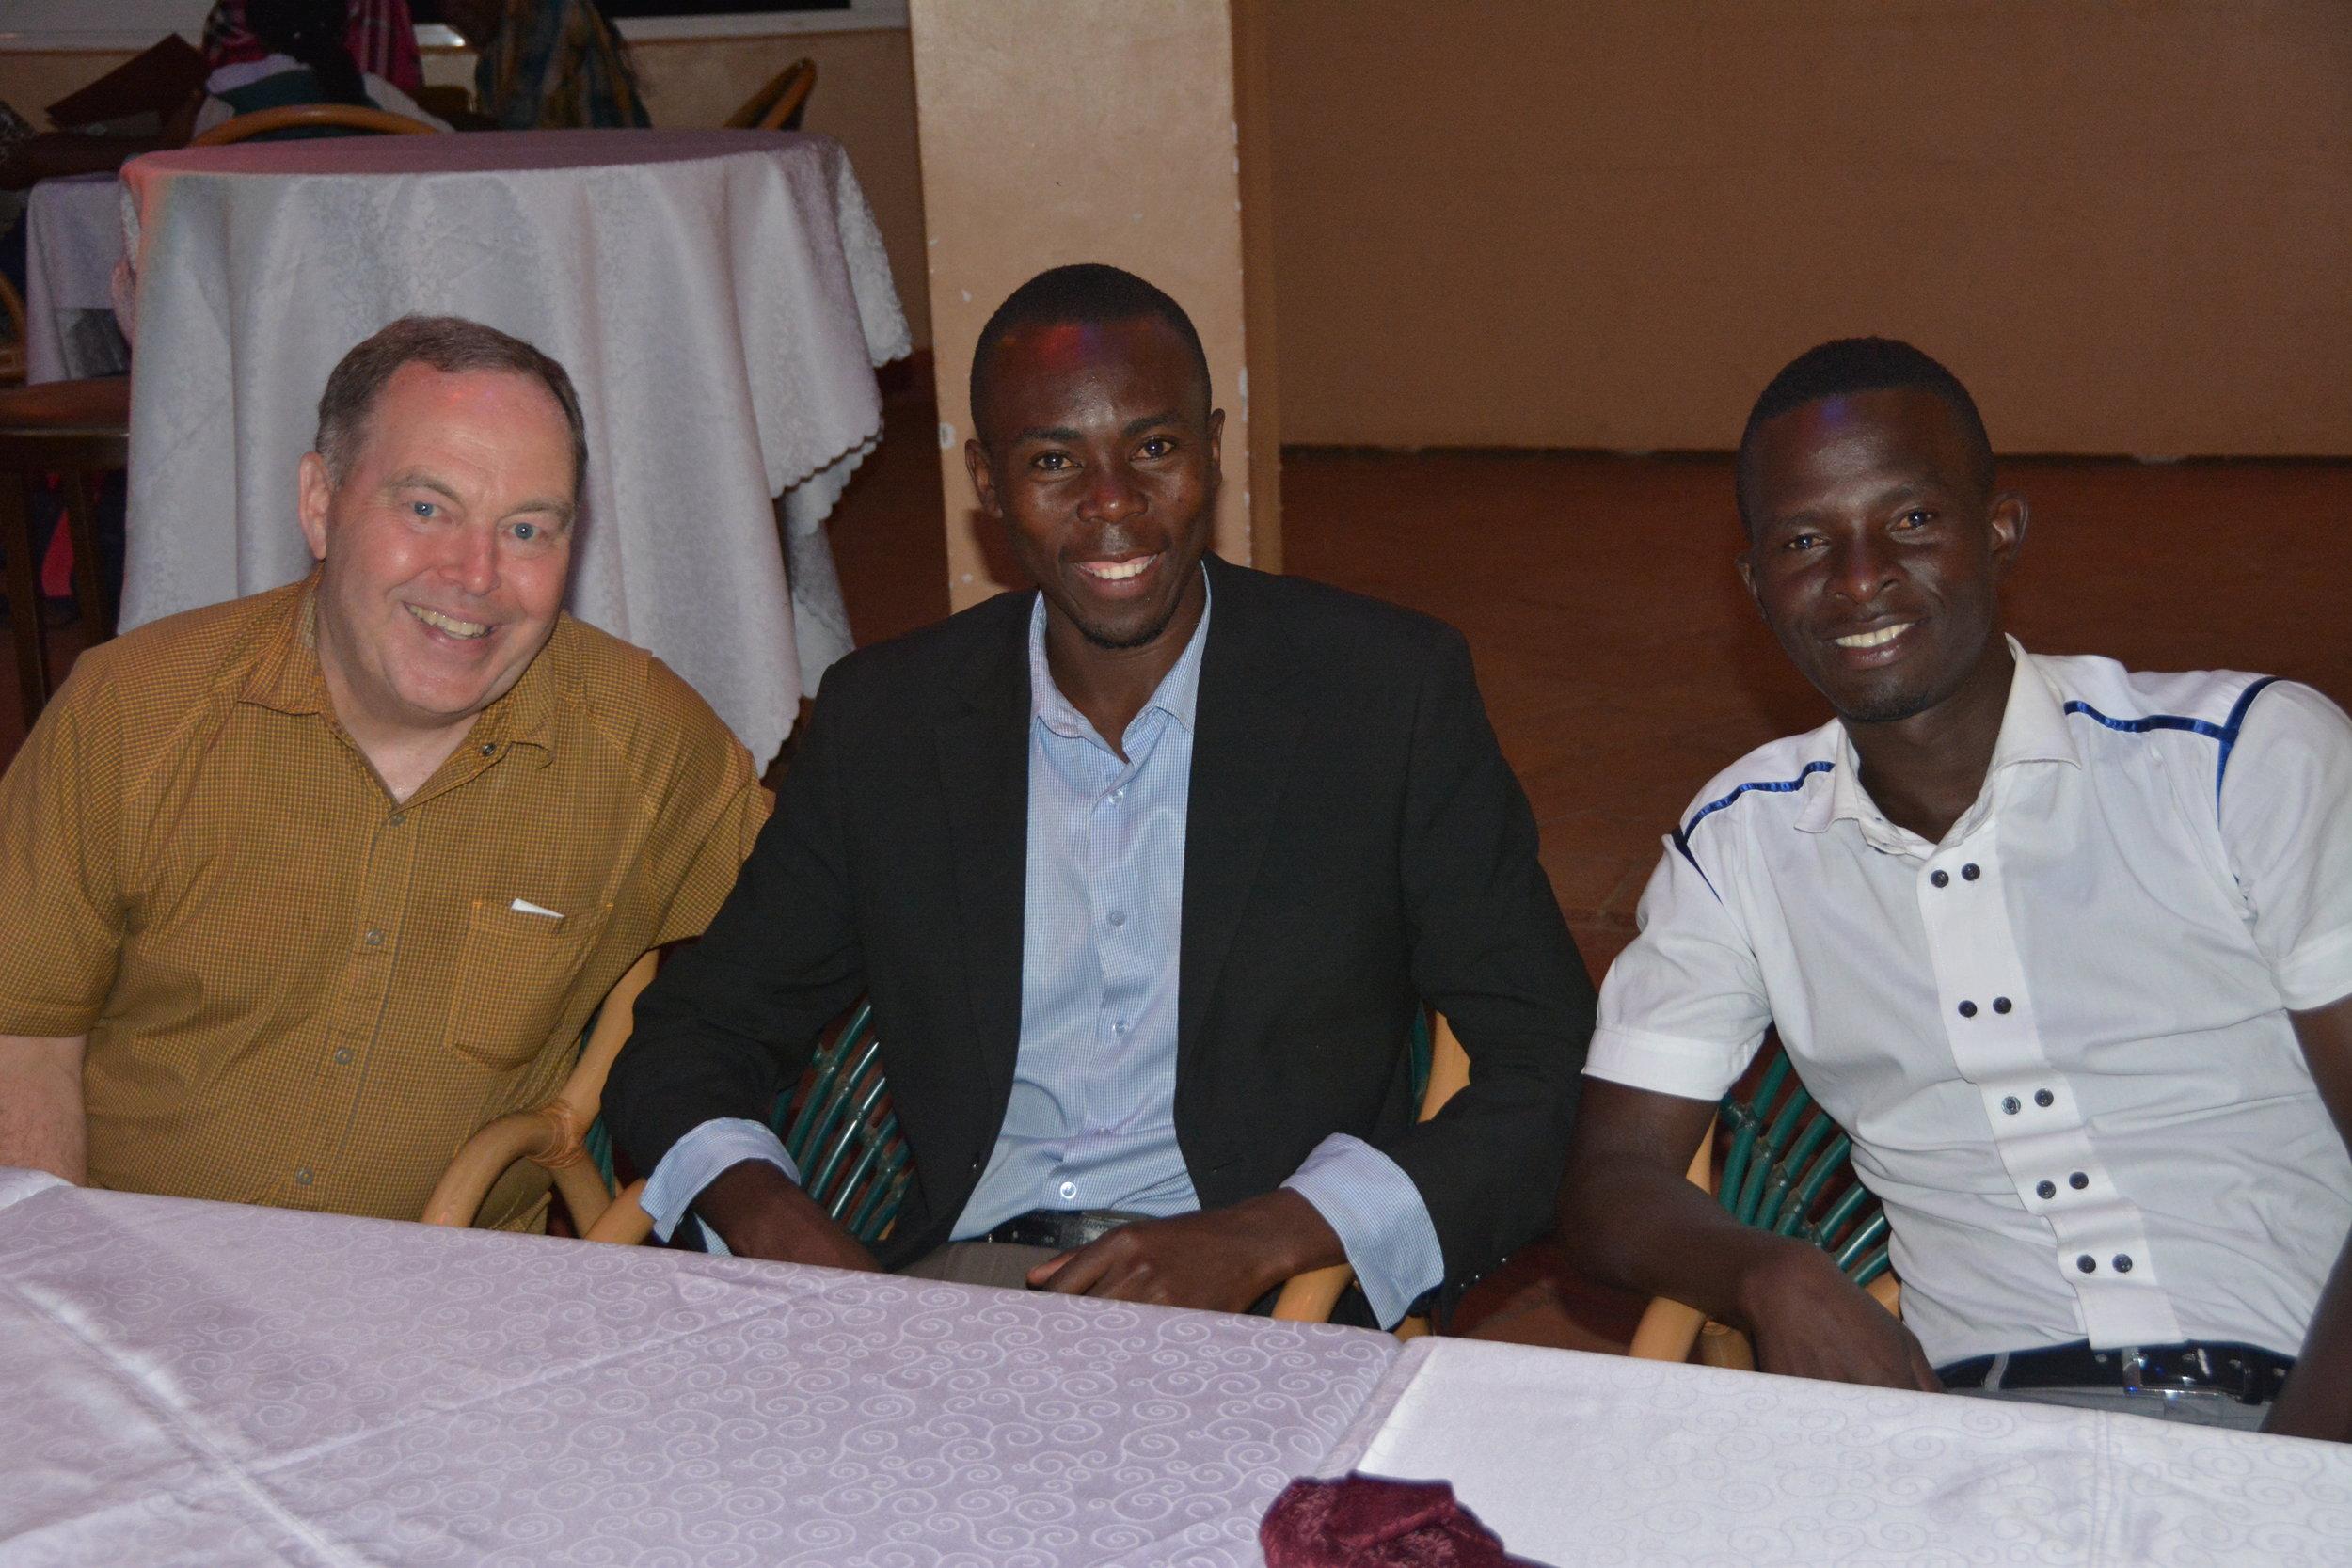 Randy at dinner with 2 CROSO graduates